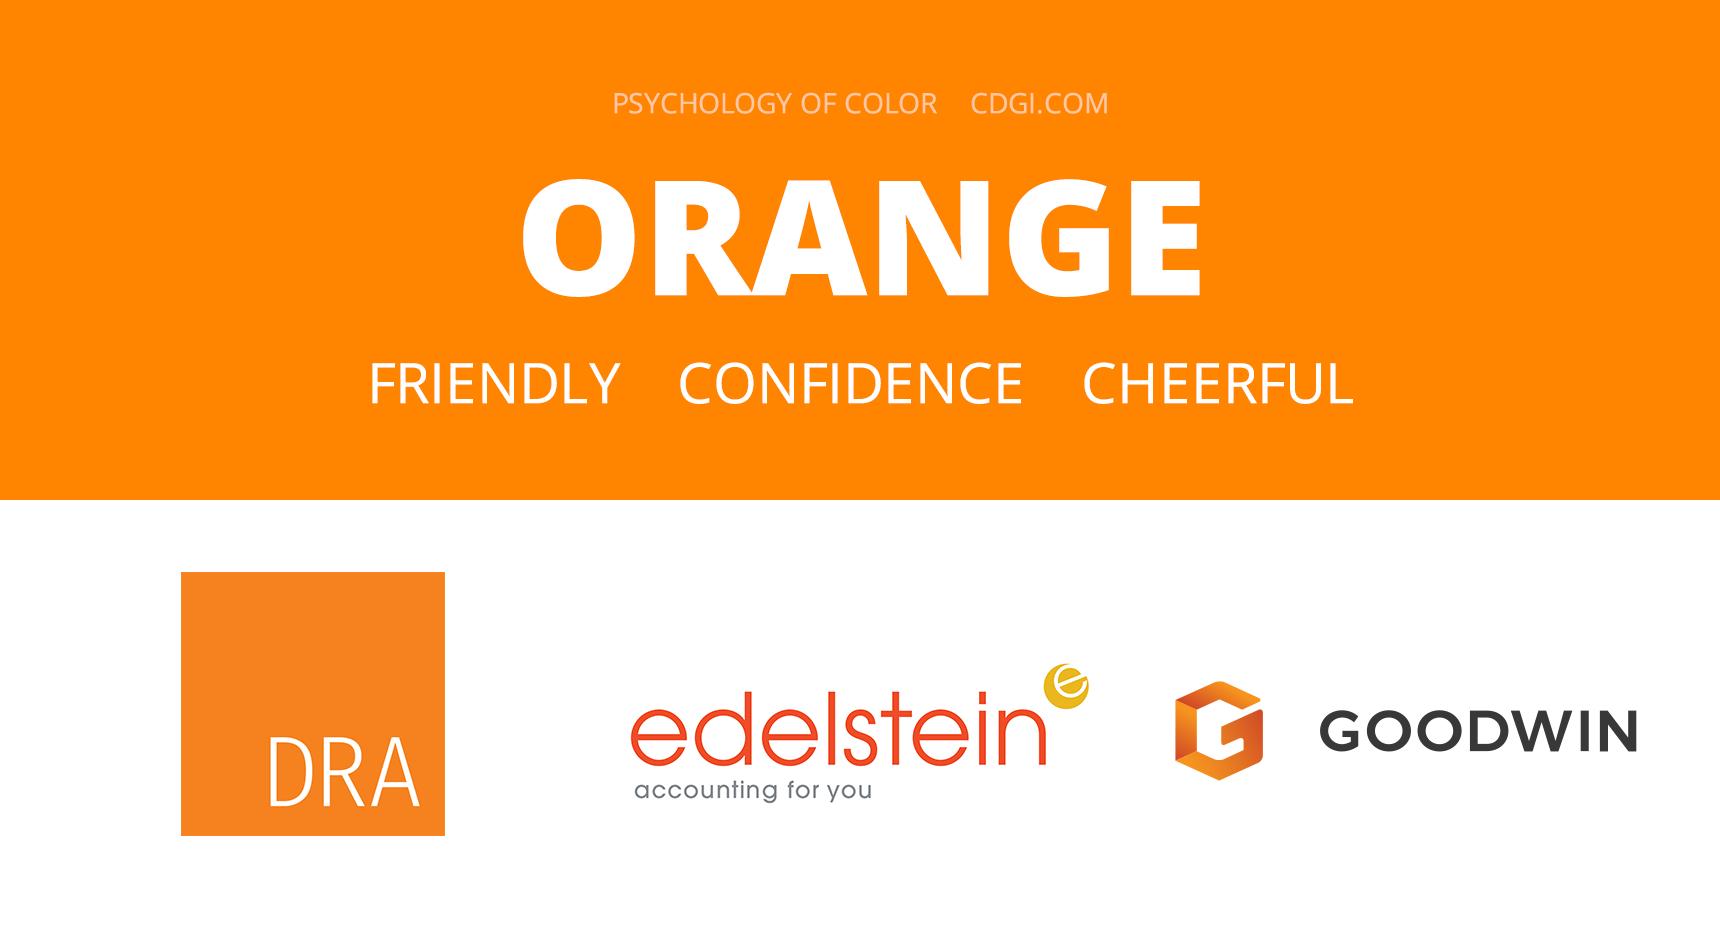 Orange: Friendly, Confidence, Cheerful